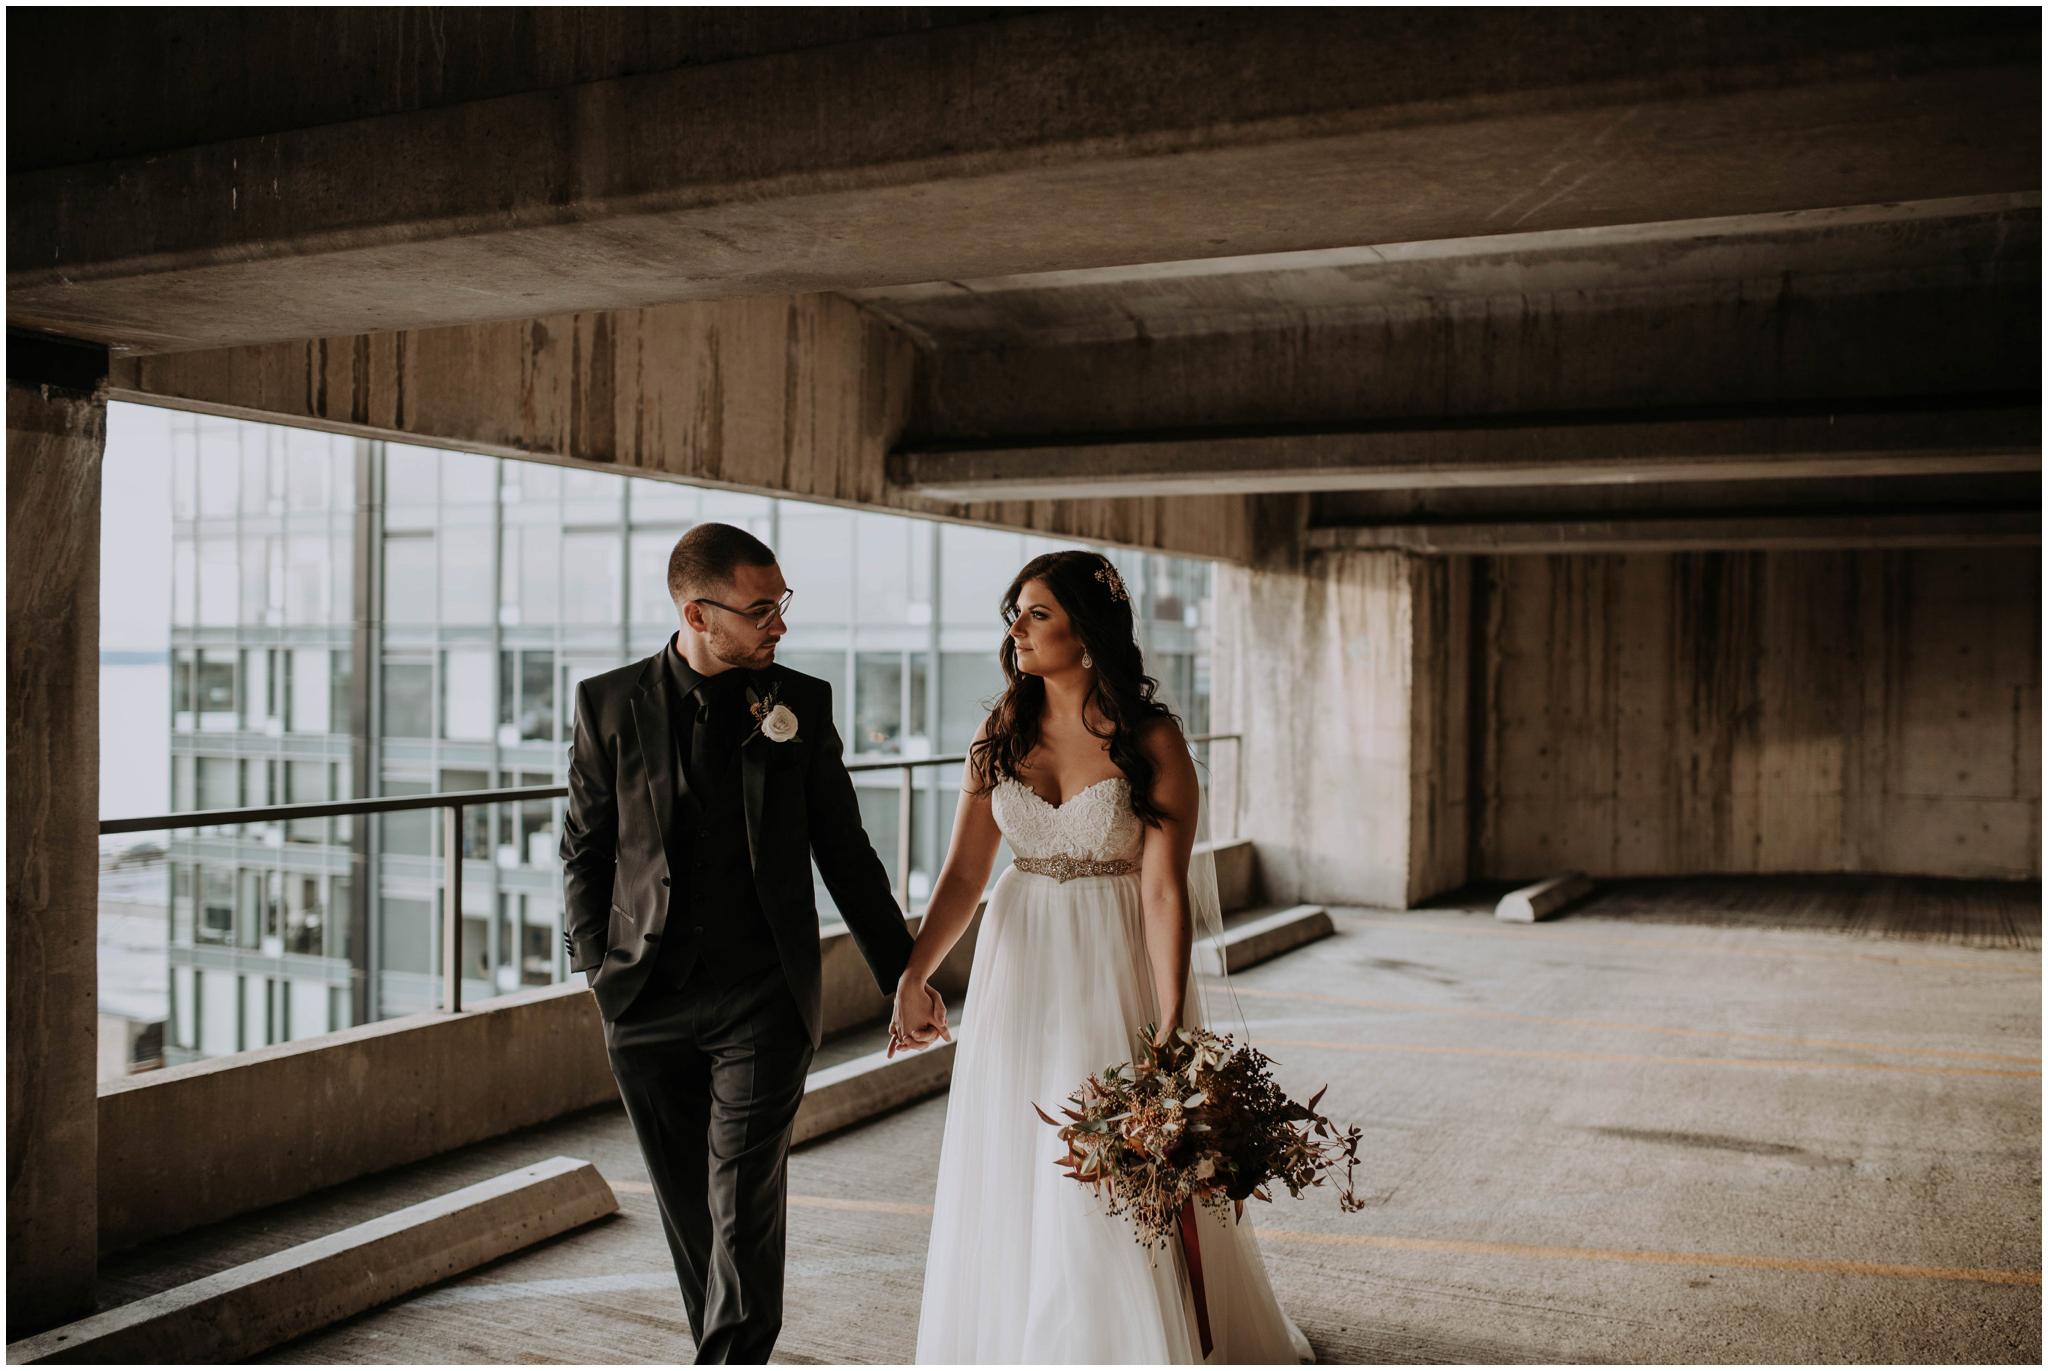 danny+mackenzie+downtown-seattle-axis-wedding-seattle-photographer-058.jpg